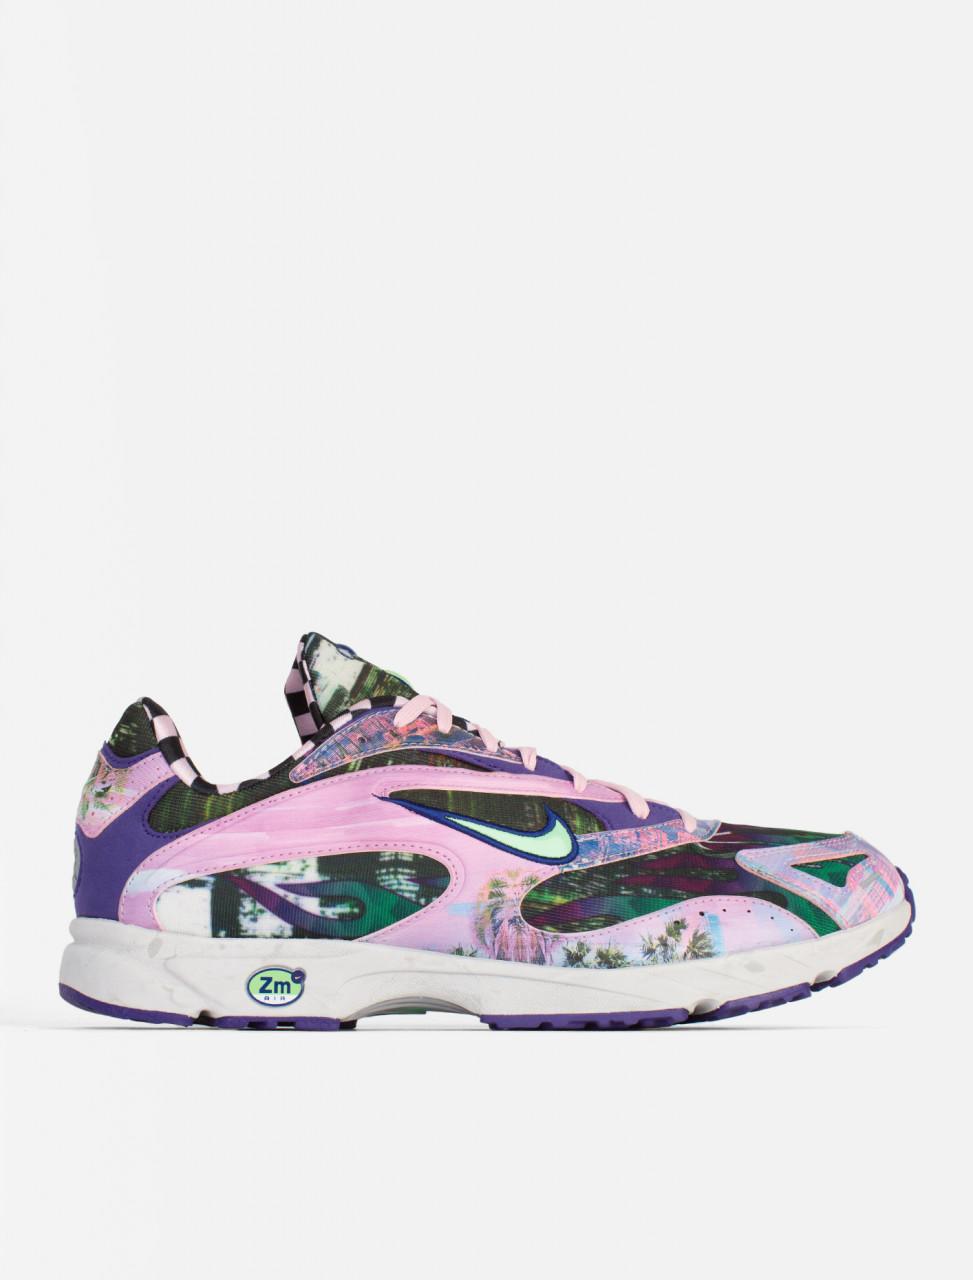 Zoom Streak Spectrum Plus Sneaker